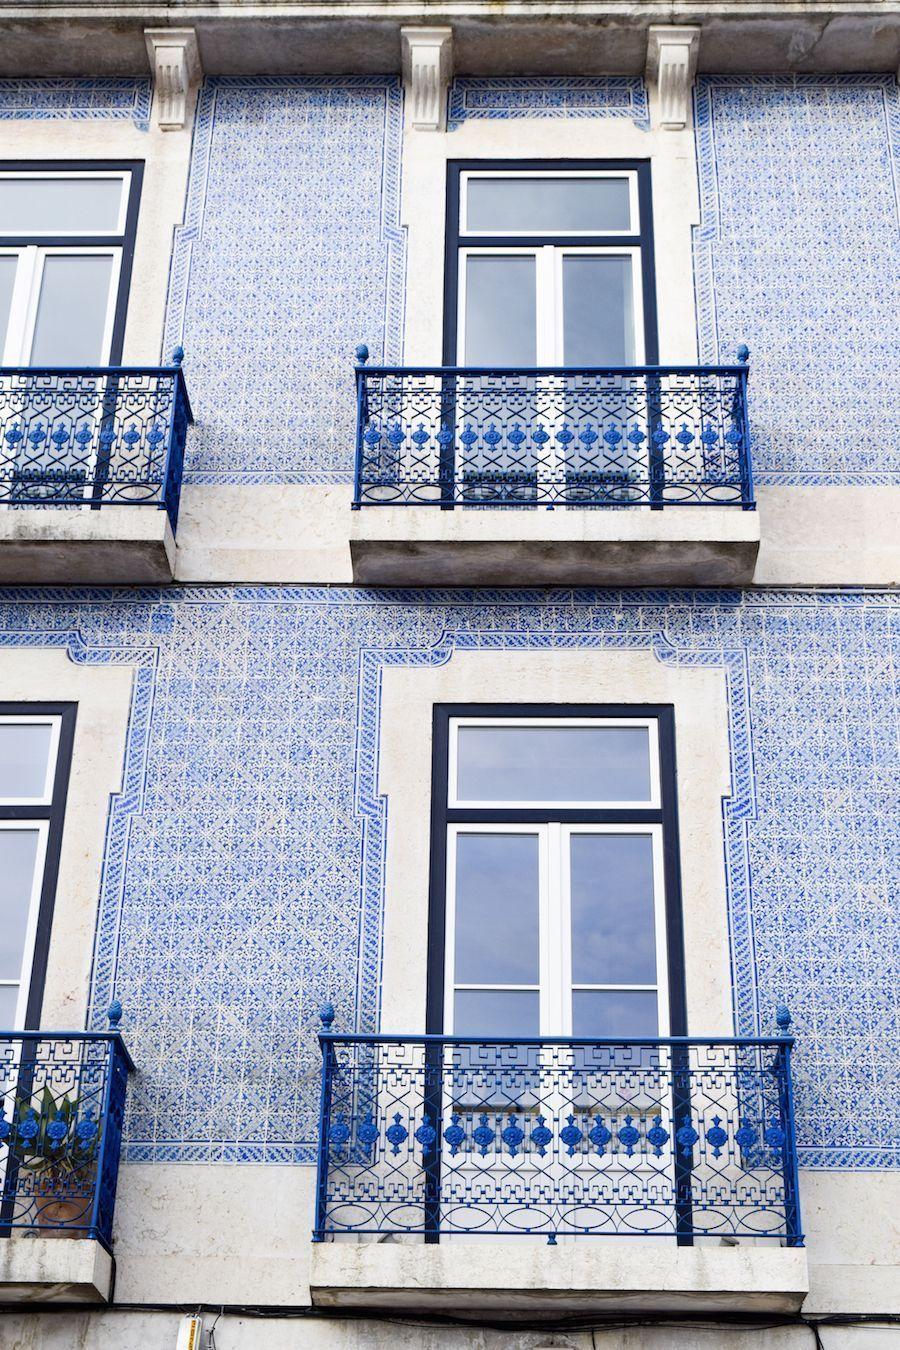 Blue Building East of Lisbon, Portugal